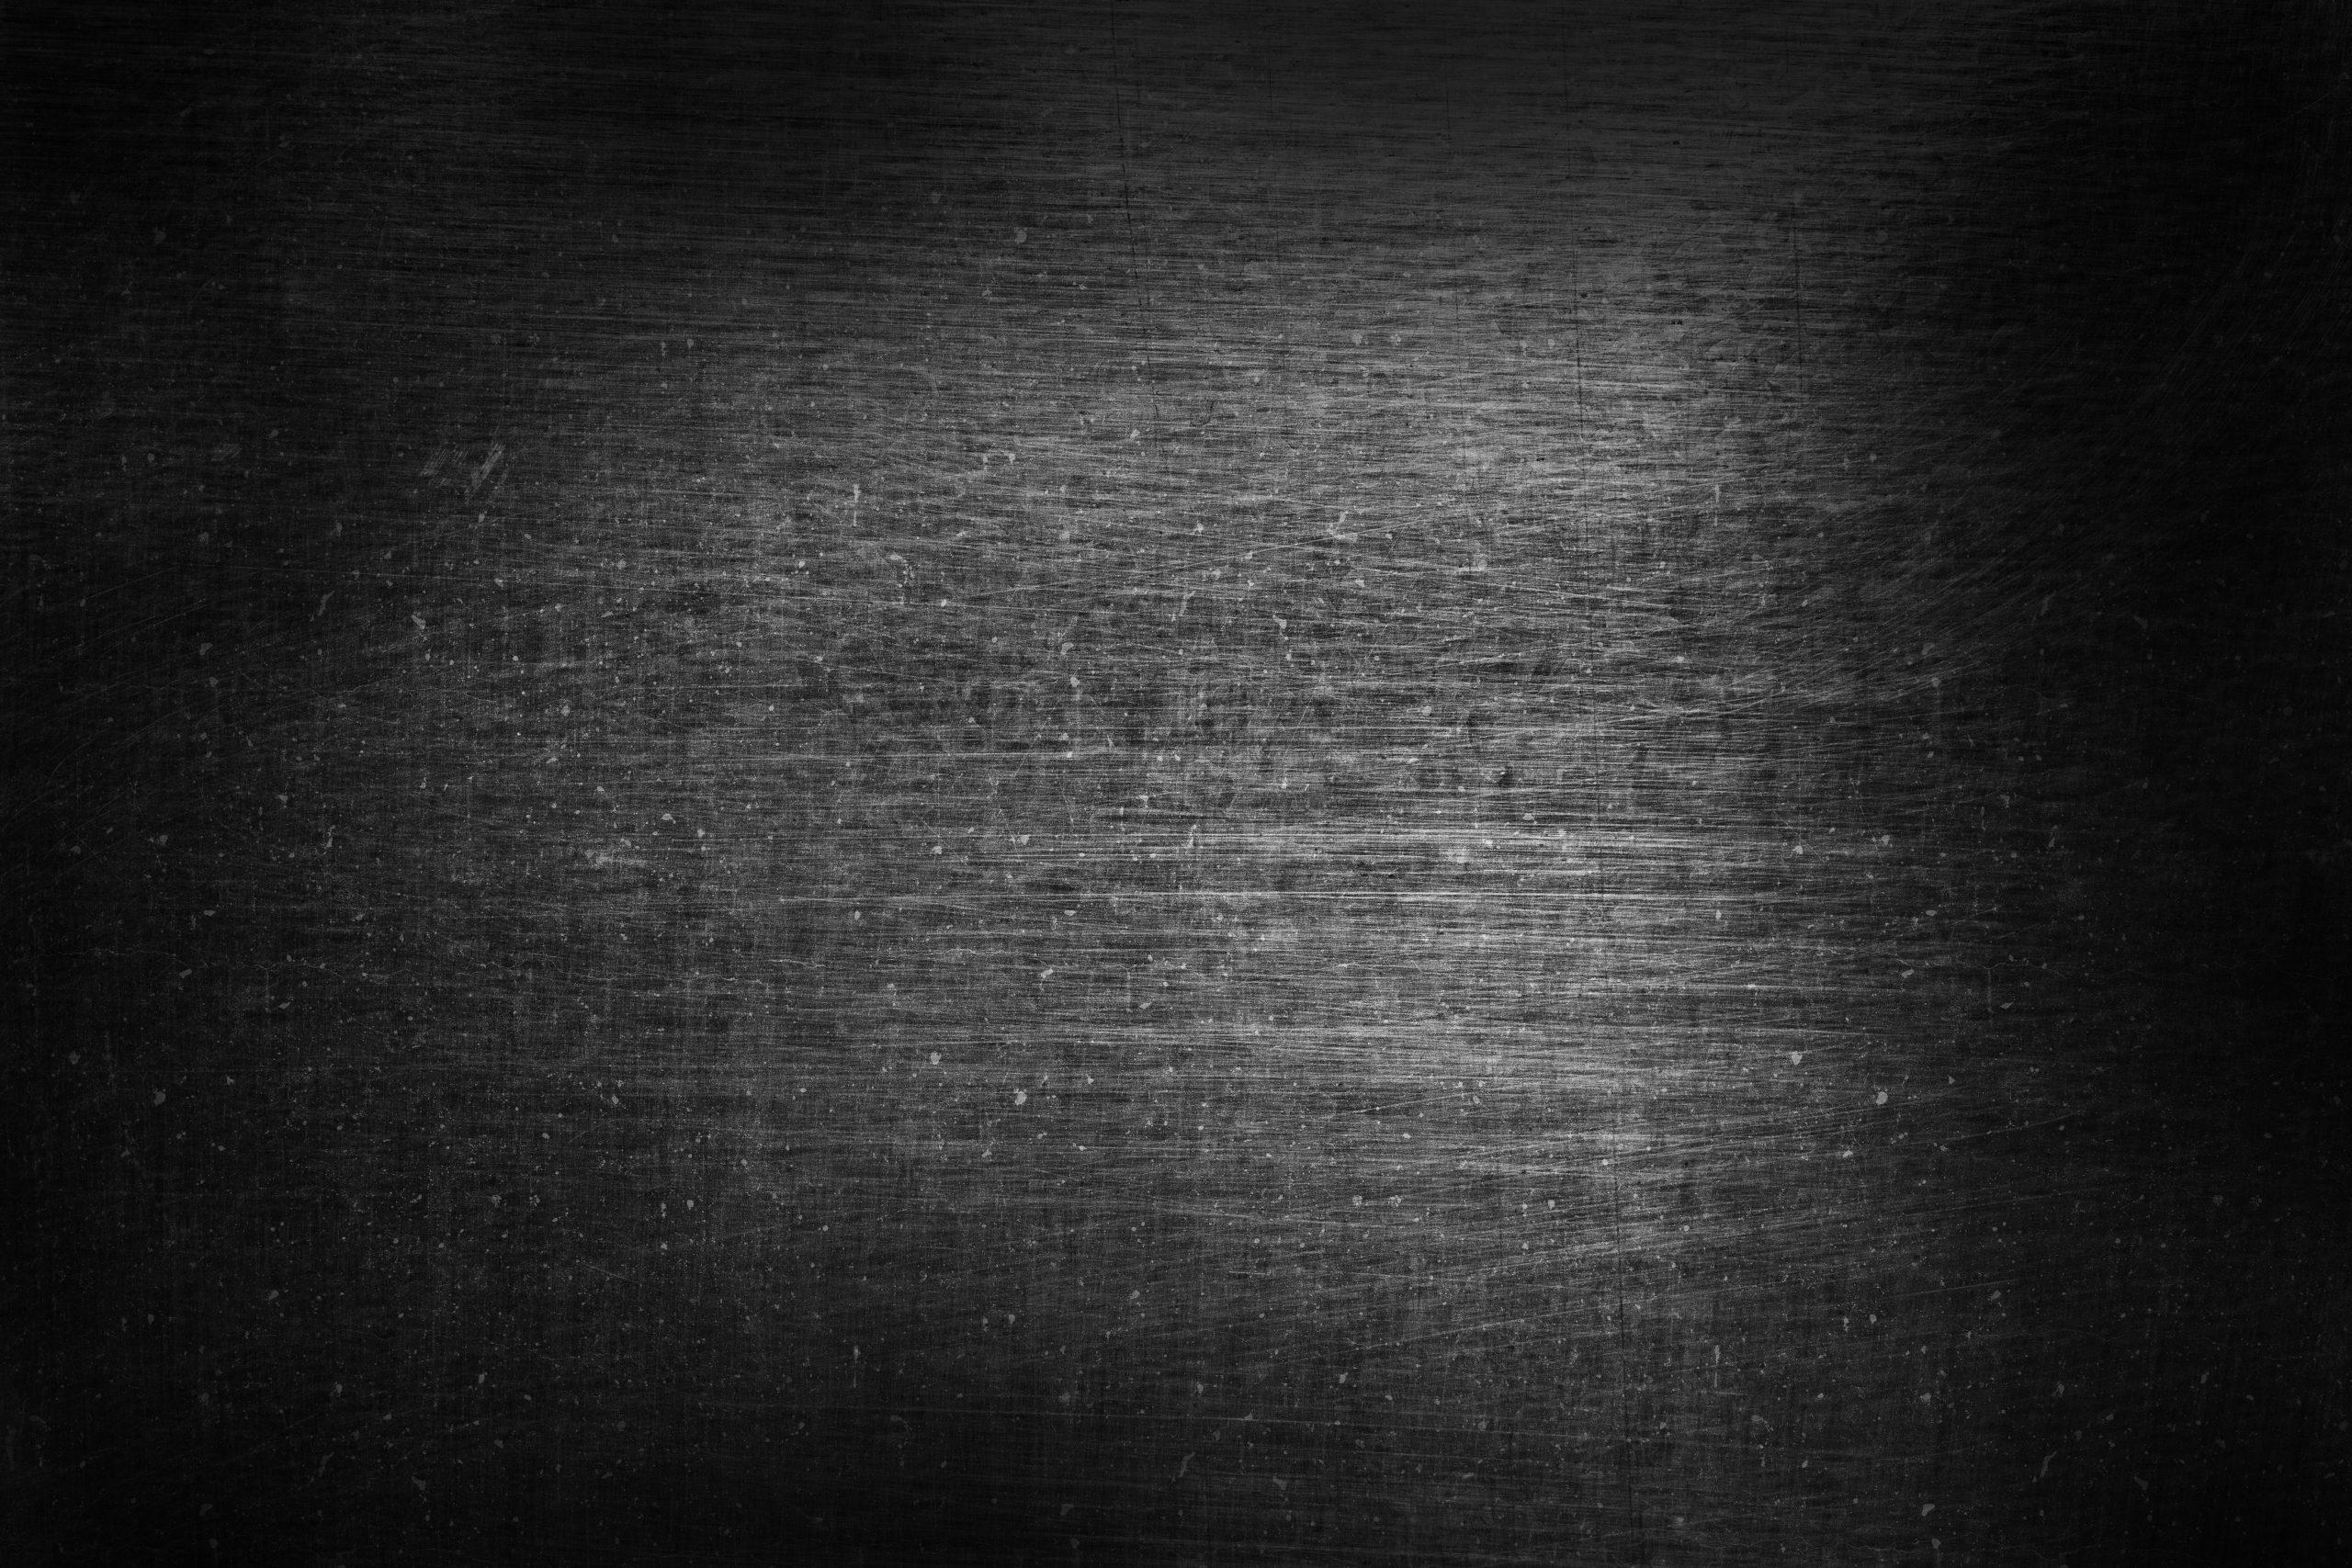 wildtextures-black-scratched-plate